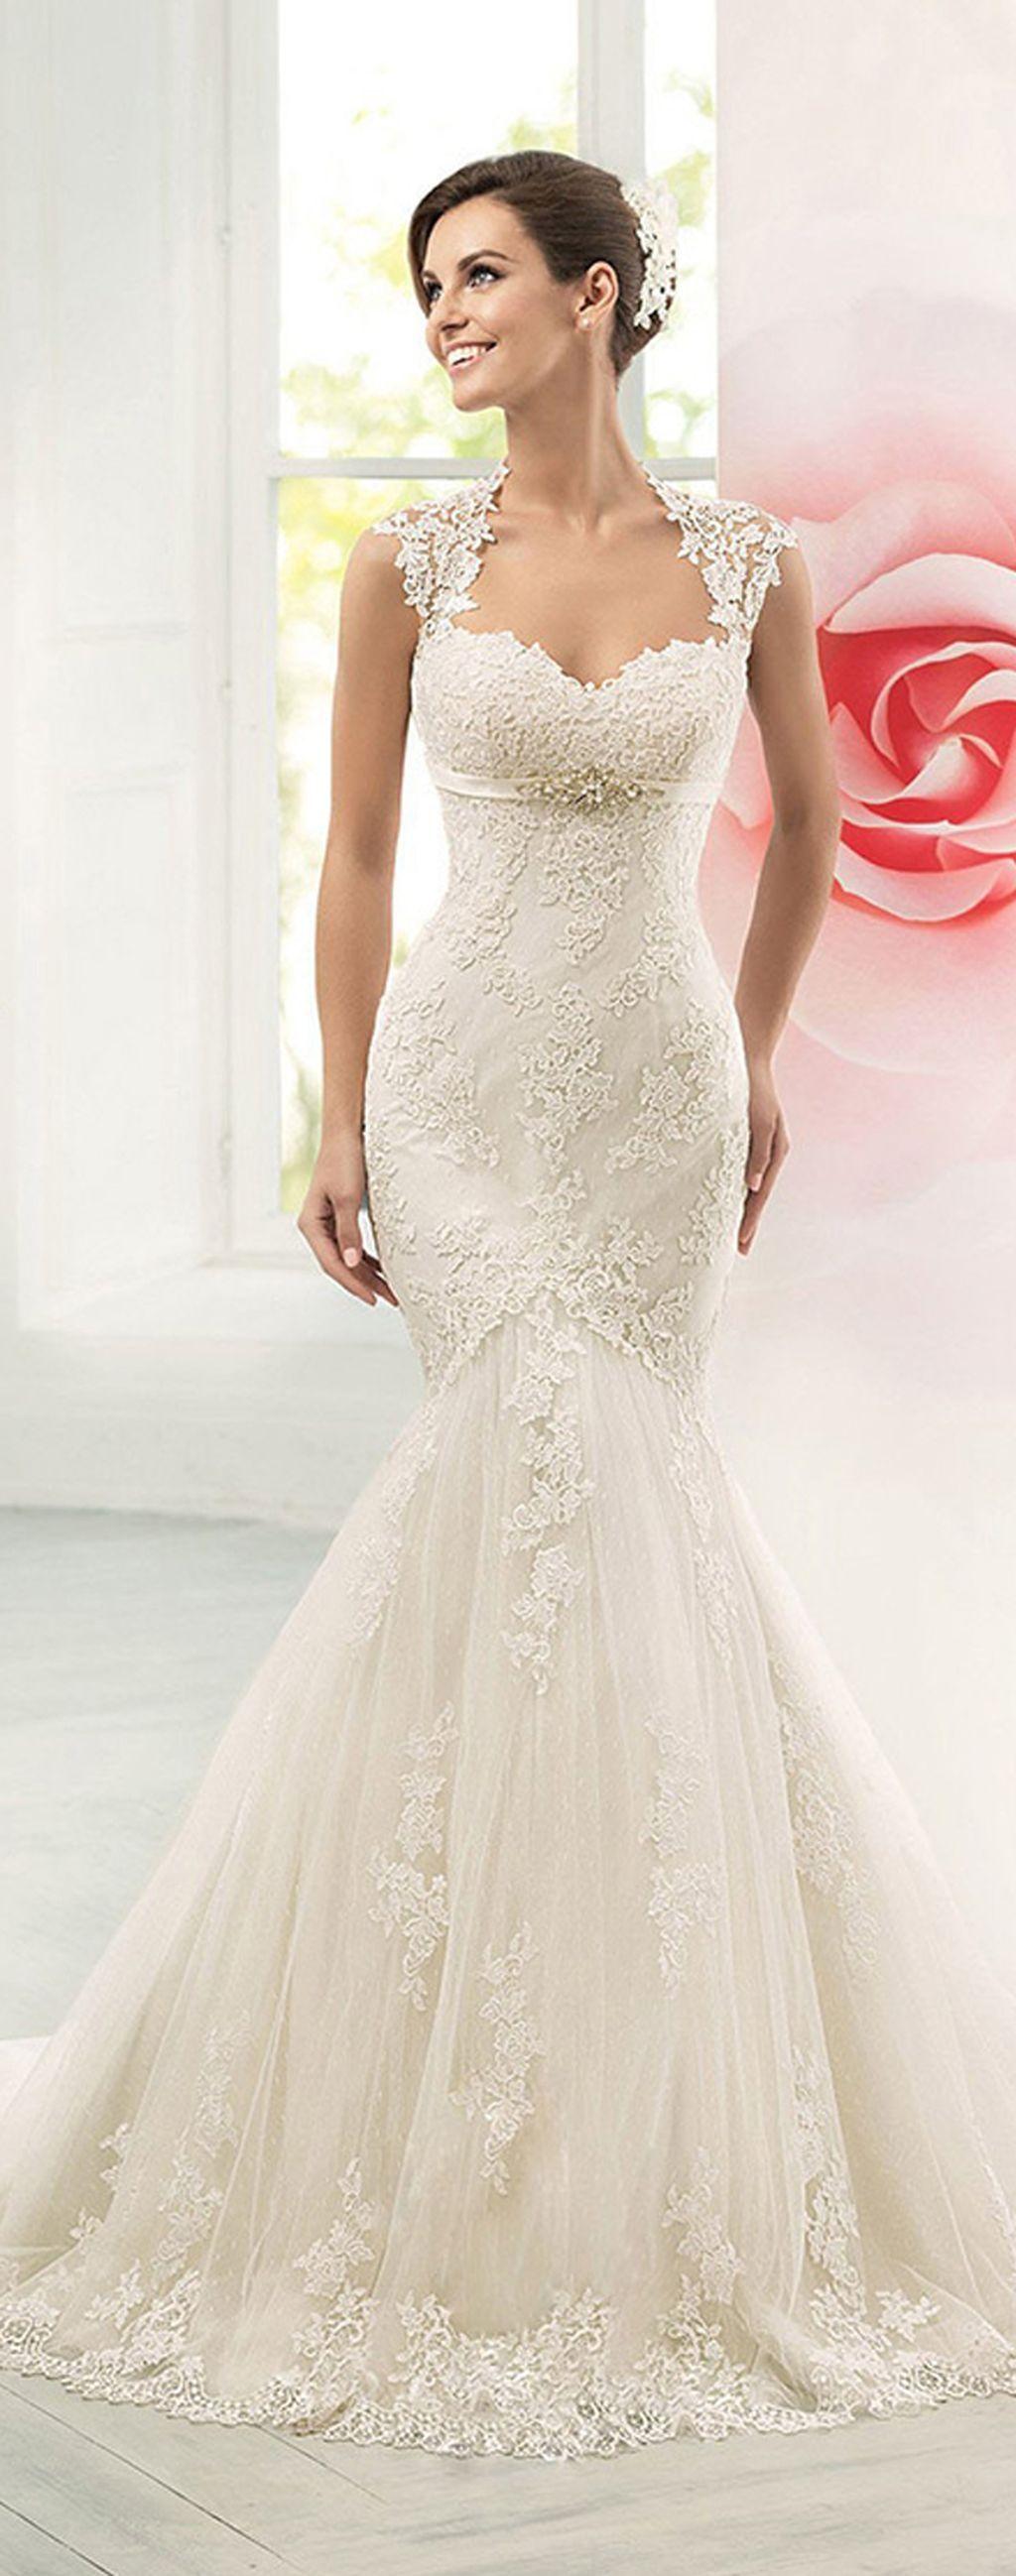 stunning mermaid wedding dress ideas every women will love